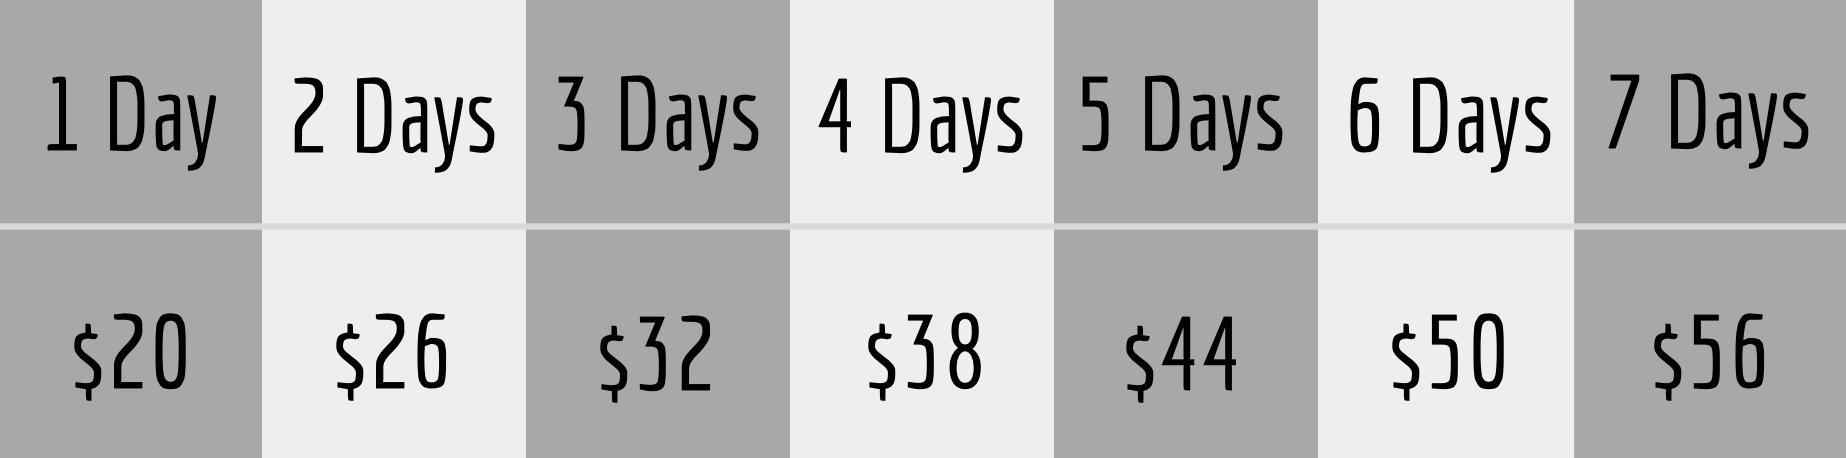 Studio Boise Photography Center lens rental prices